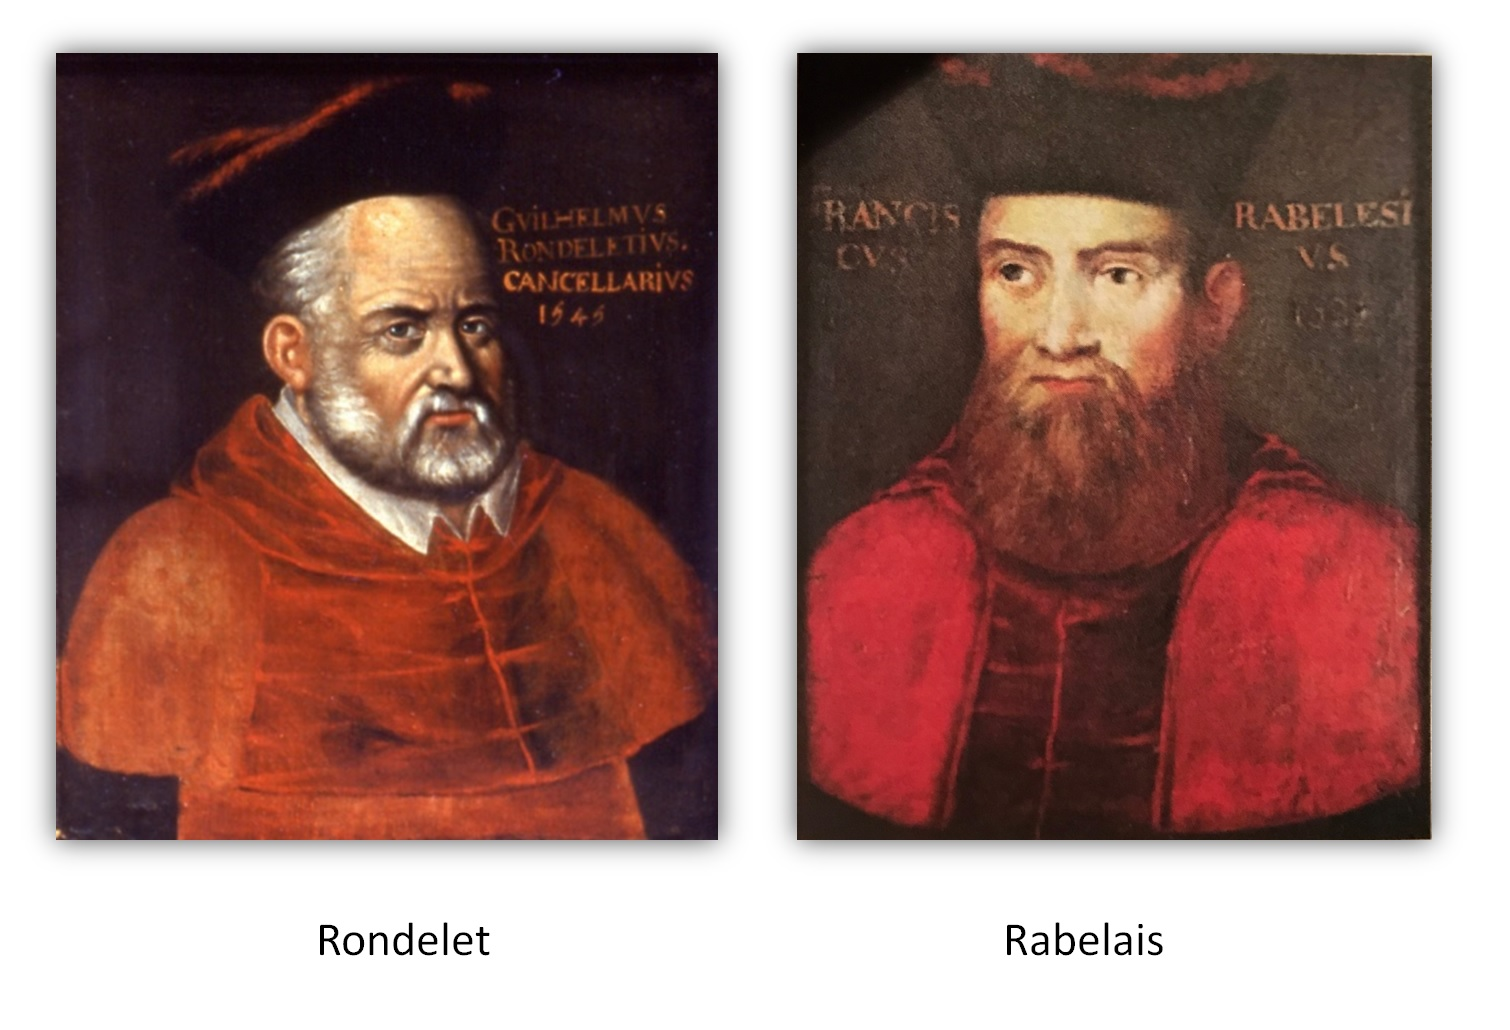 4. 1452-1556 Rabelais et Rondelet